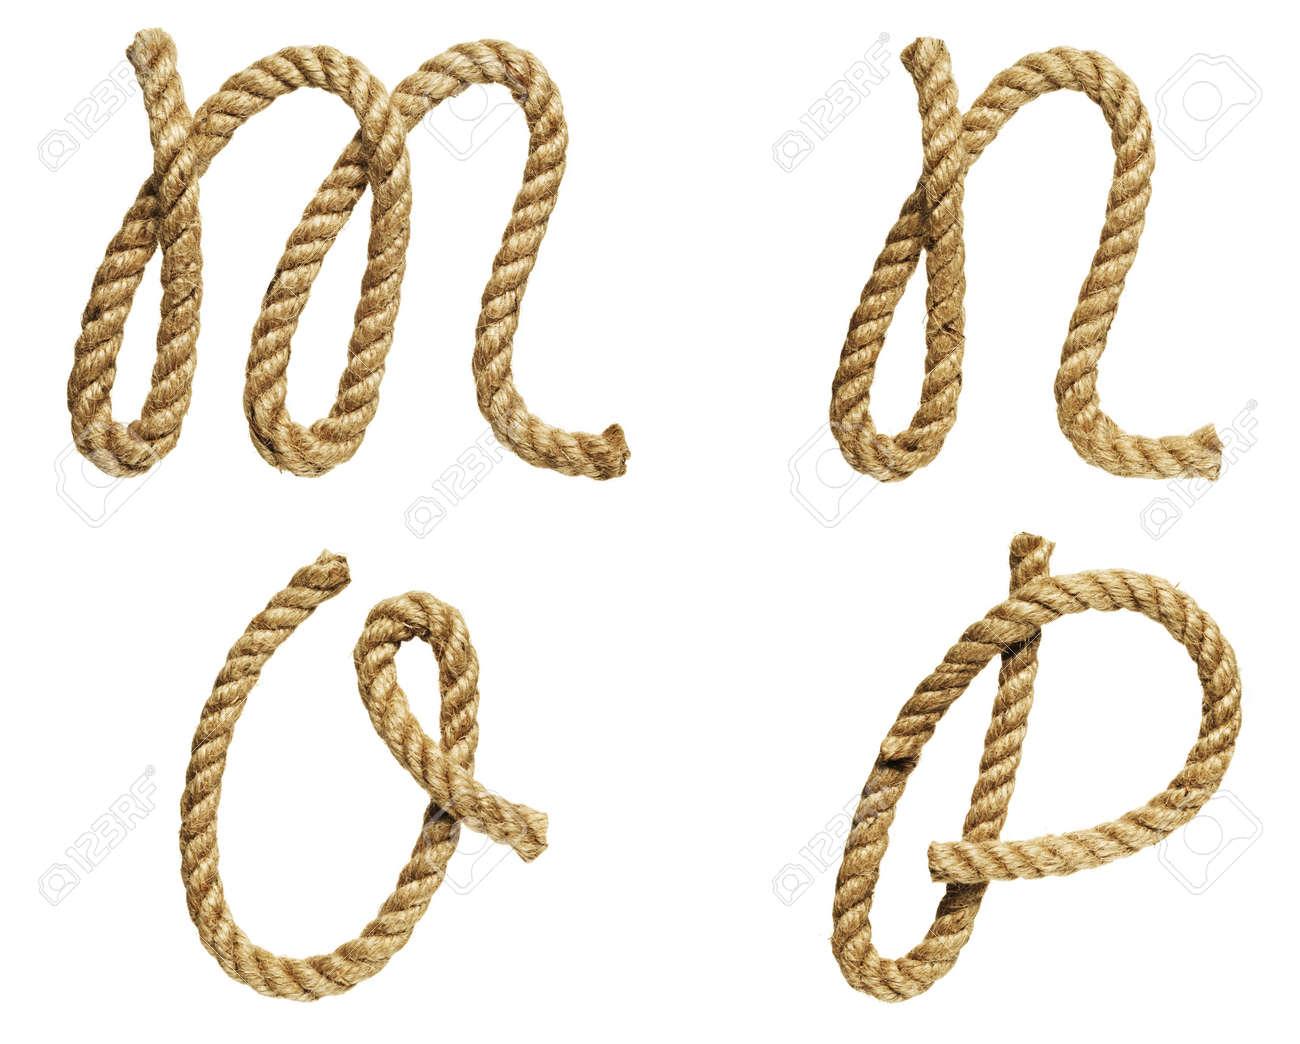 old natural fiber rope bent in the form of letter M, N, O, P